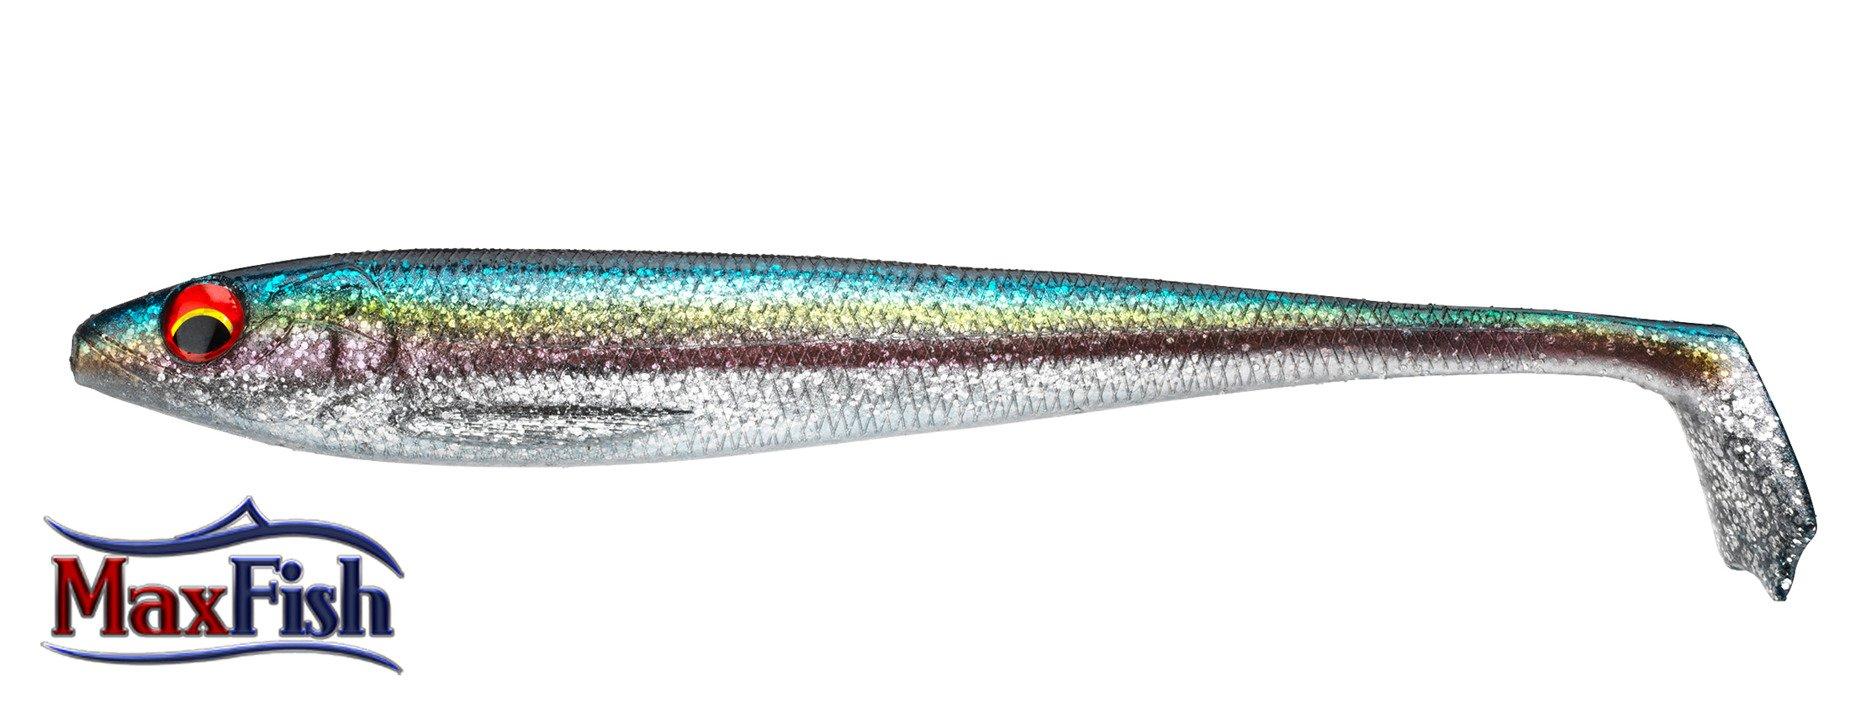 Daiwa Prorex Duckfin Shad XL - 25cm Urume